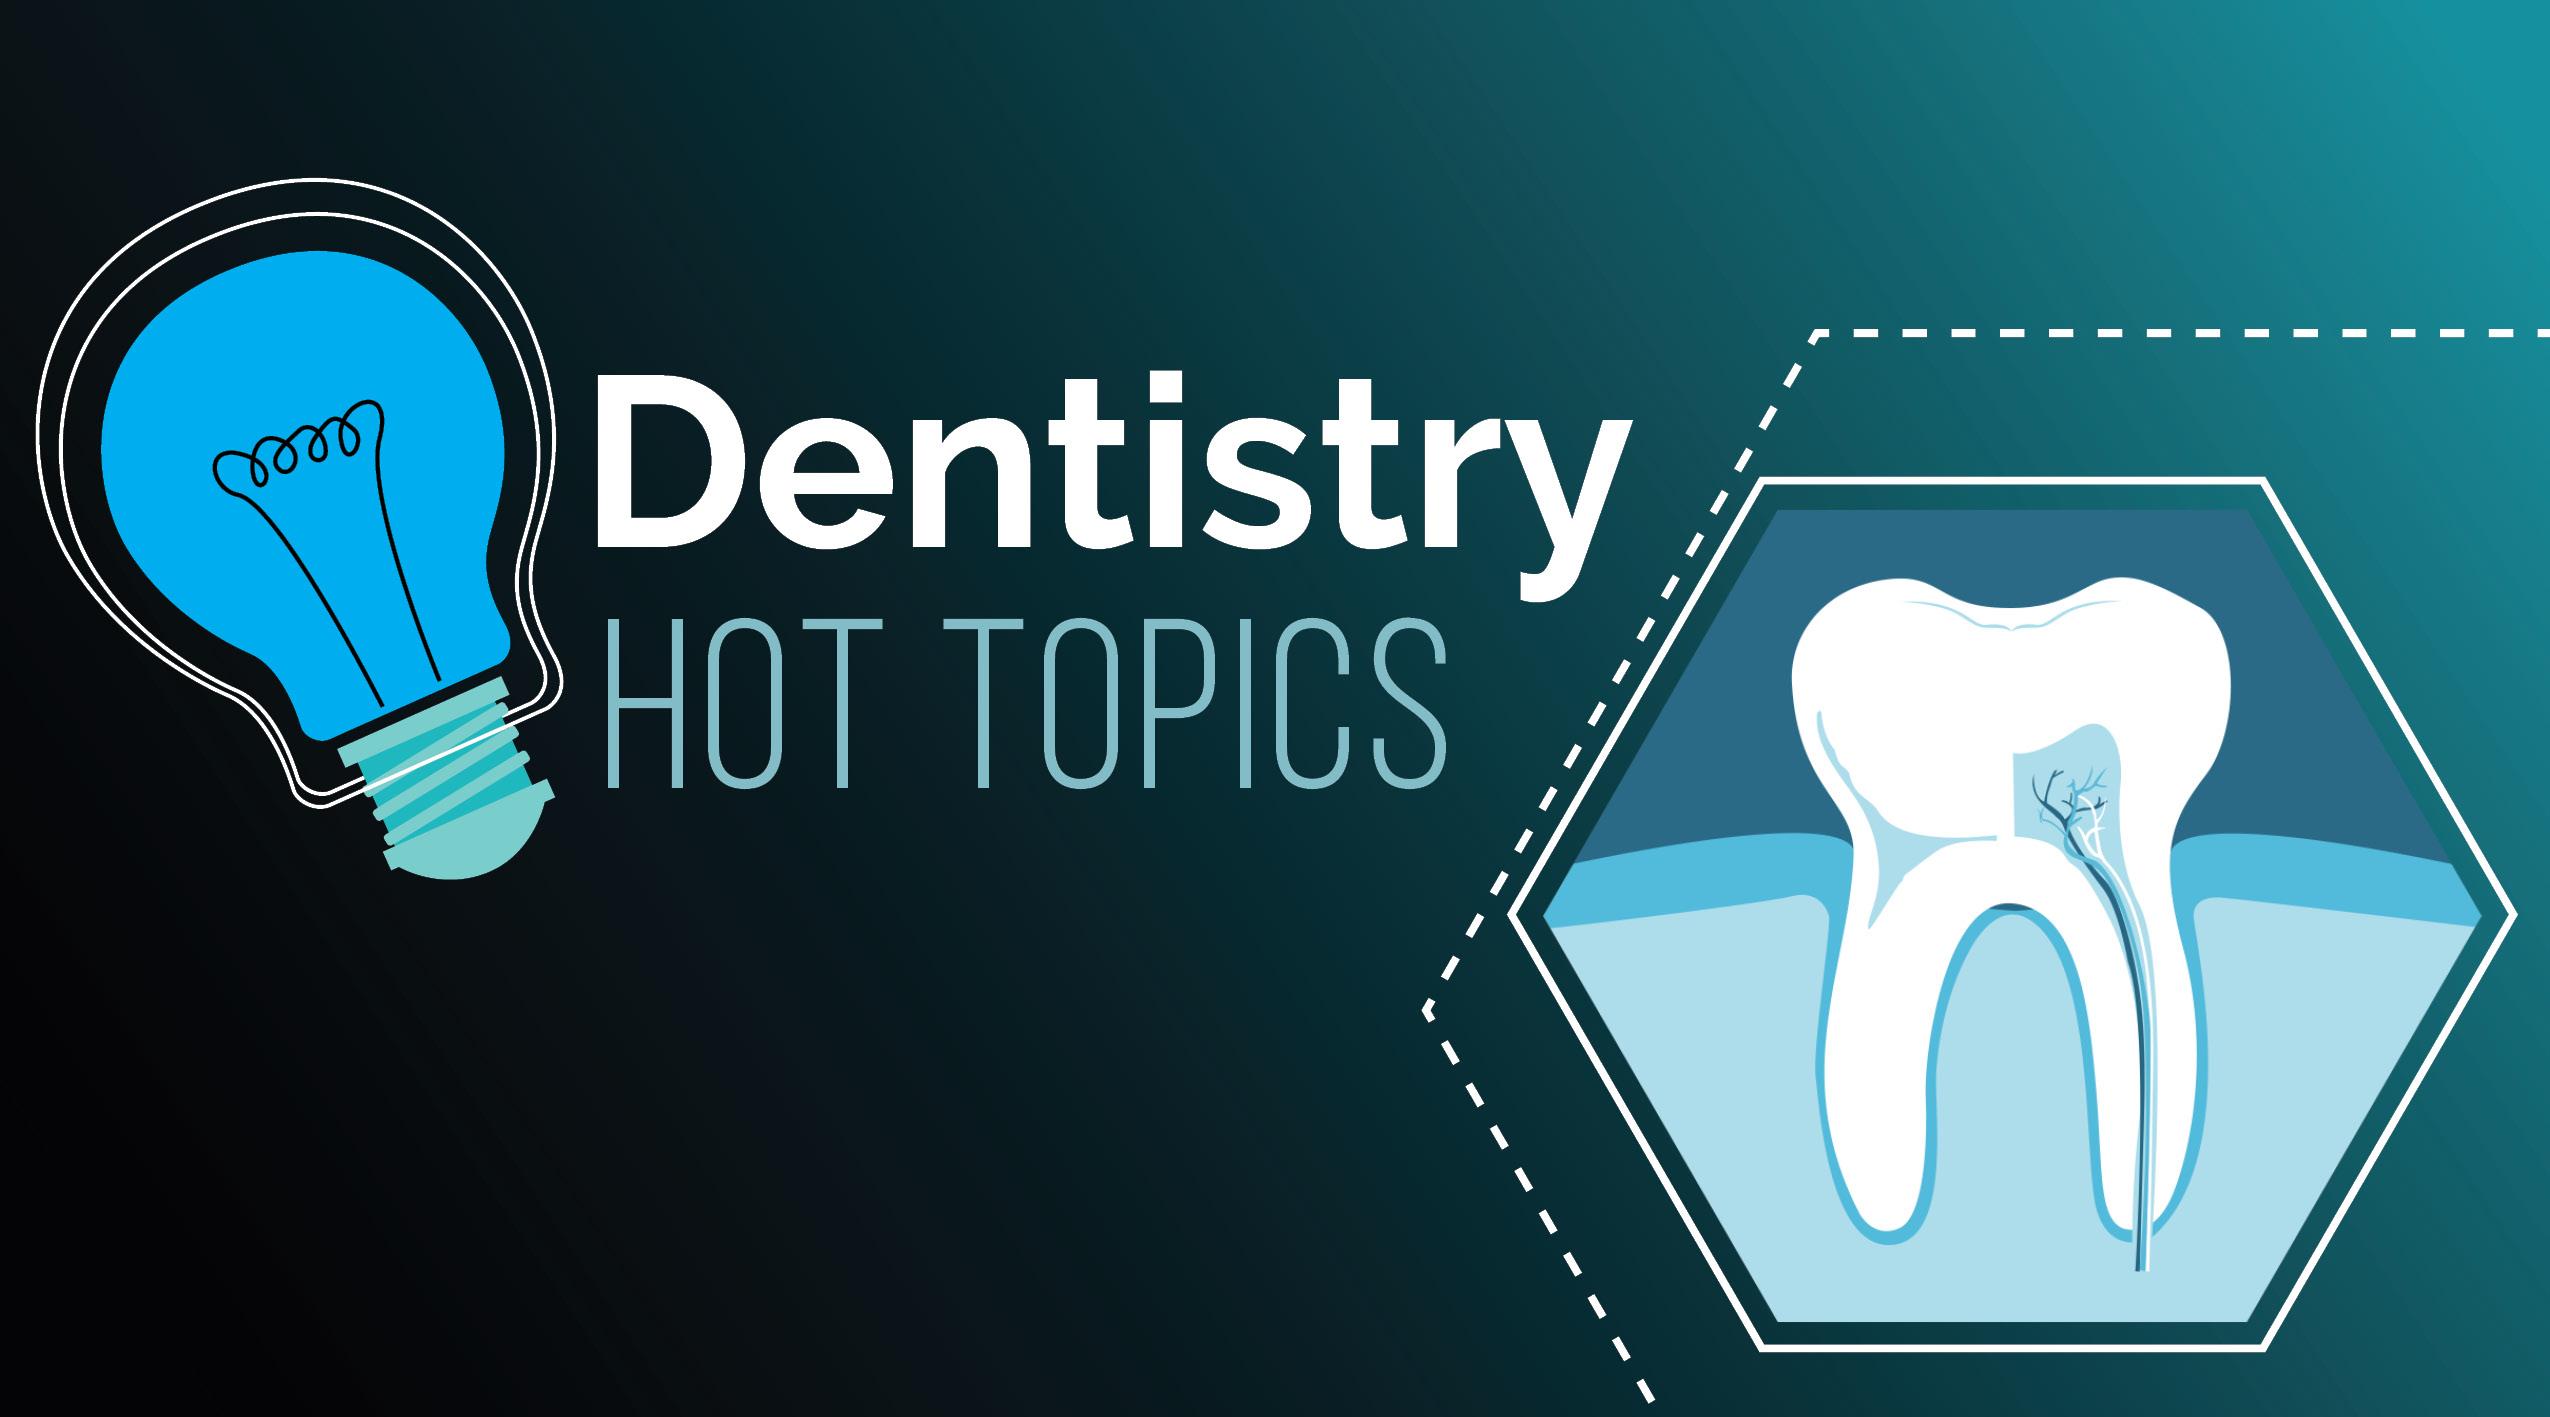 Dentistry Hot Topics Indianapolis